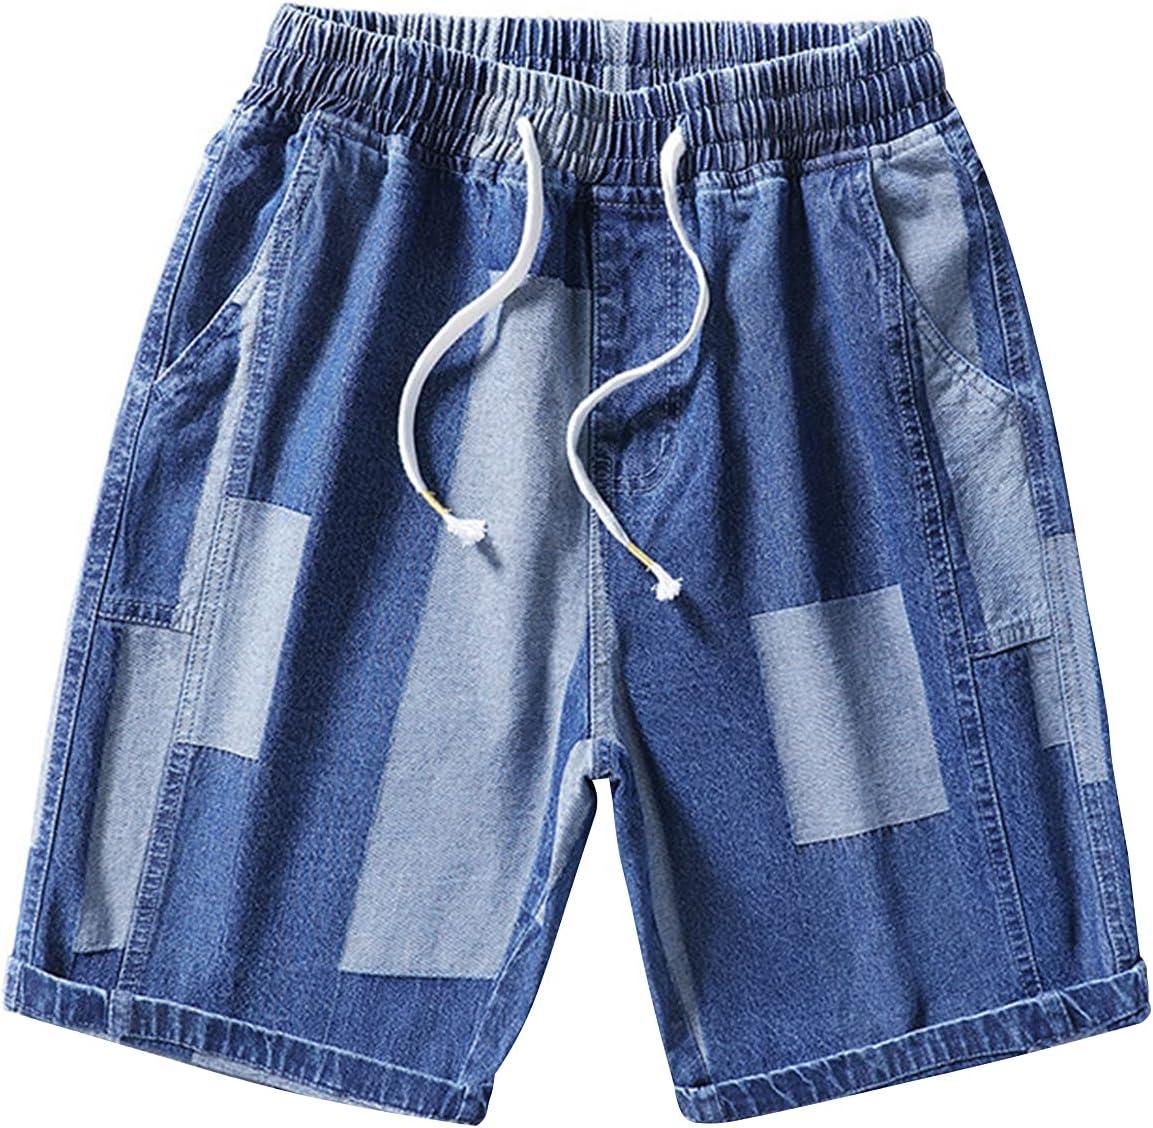 Men's Color Block Denim Shorts Patchwork Drawstring Elastic Waist Short Jeans Relaxed-Fit Knee Length Jean Shorts (Blue,Medium)